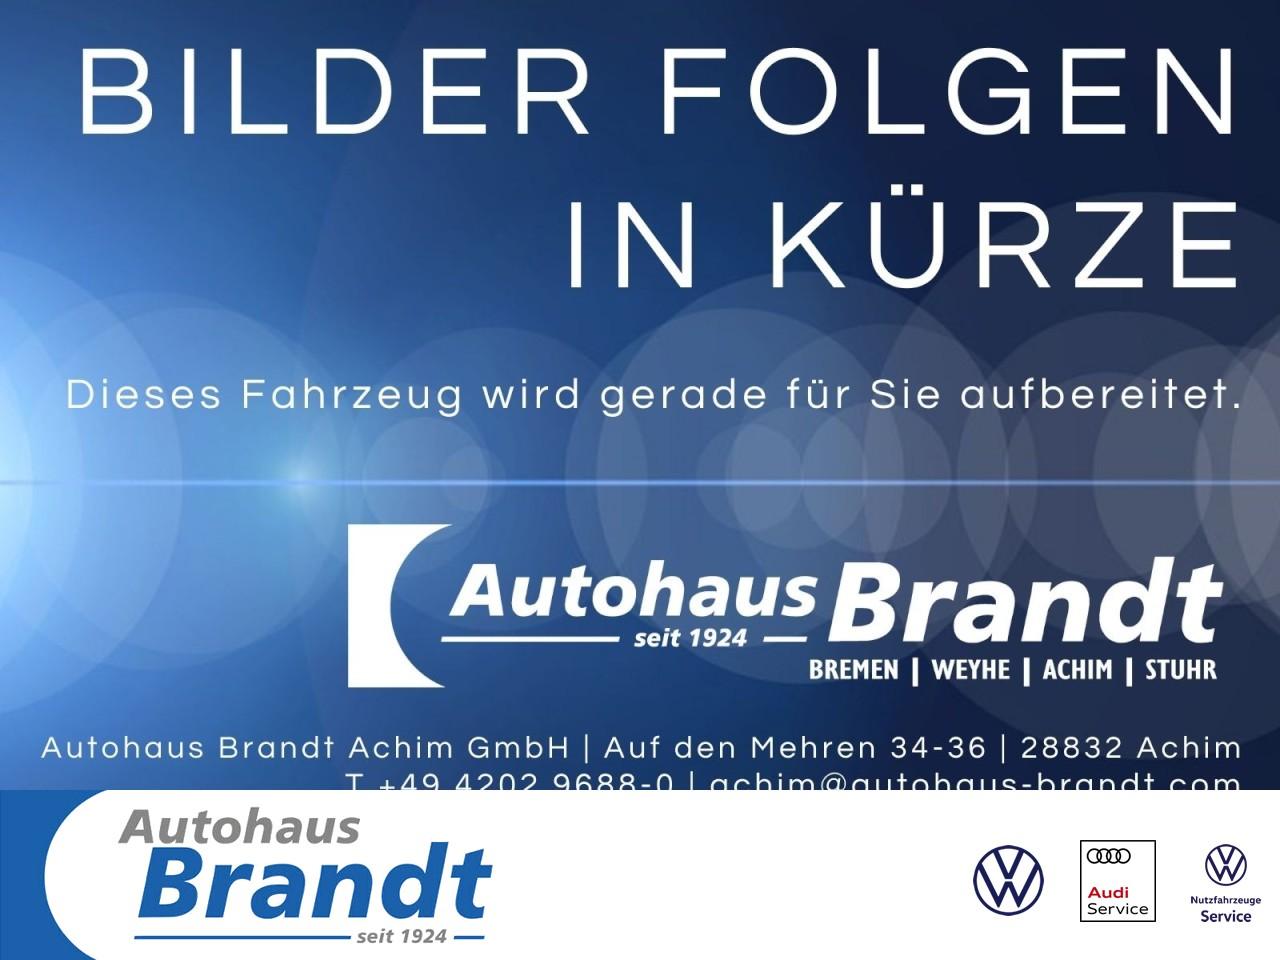 Mercedes-Benz C 43 T AMG 4Matic LED*NAVI*LEDER*DISTR.*KAMERA*AHK, Jahr 2017, Benzin